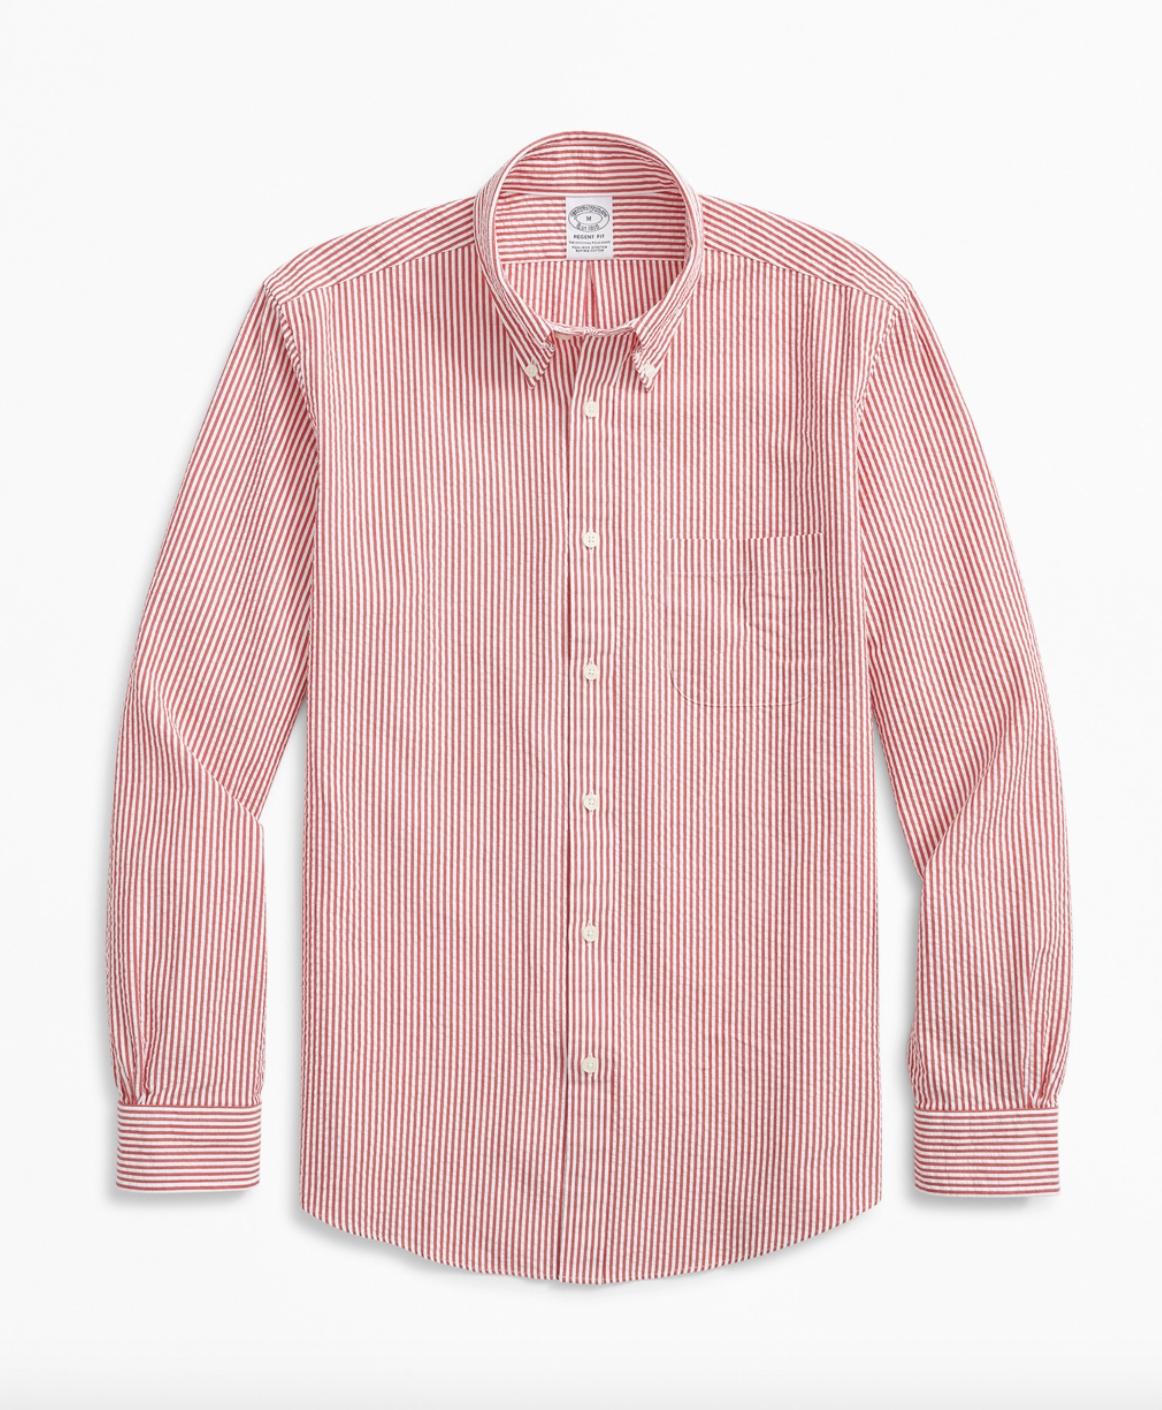 Camisa de rayas / Foto: Brooks Brothers